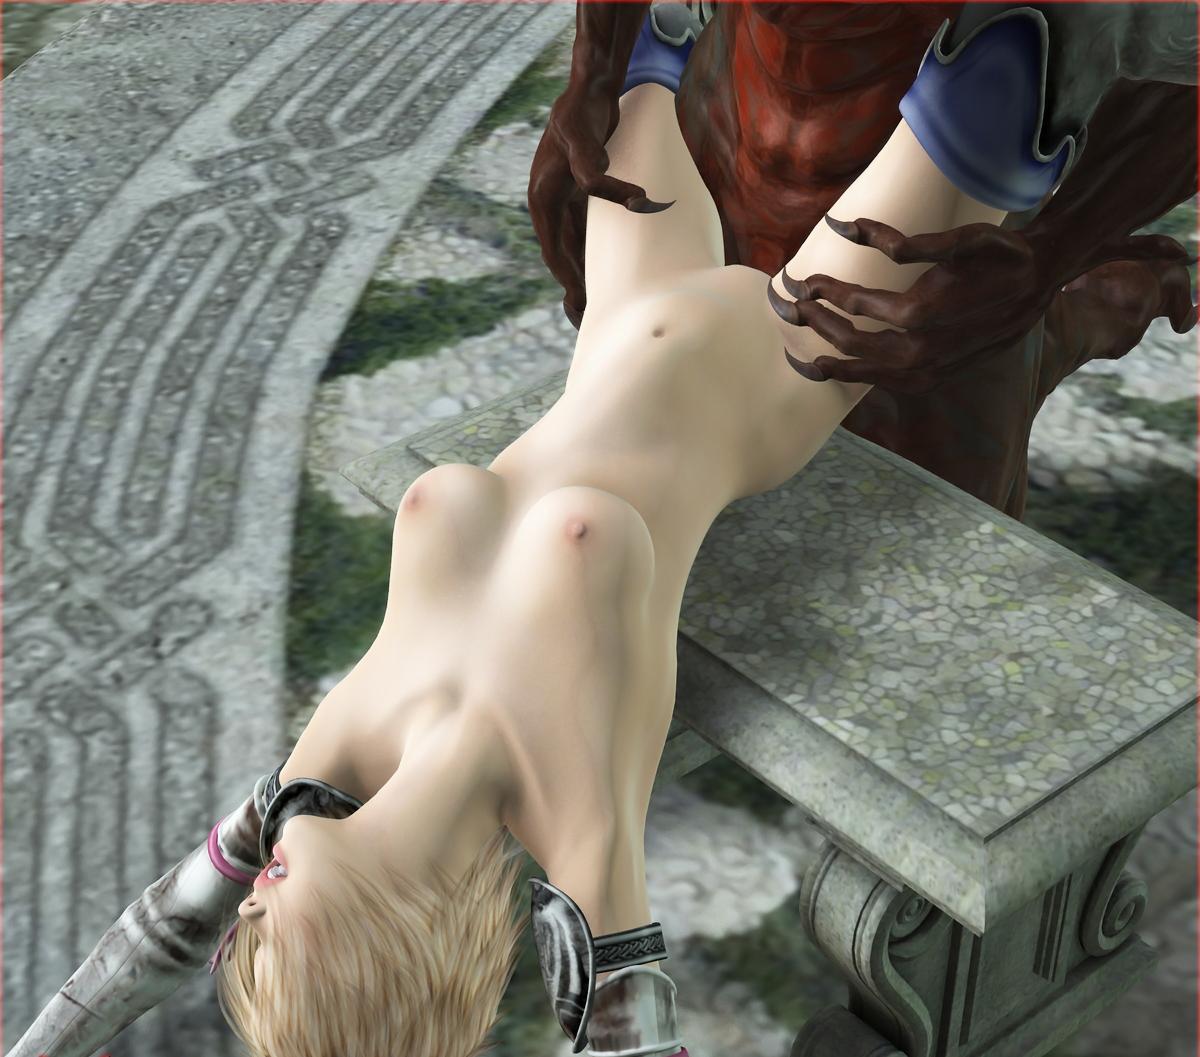 3d monster kills nude woman hardcore scene